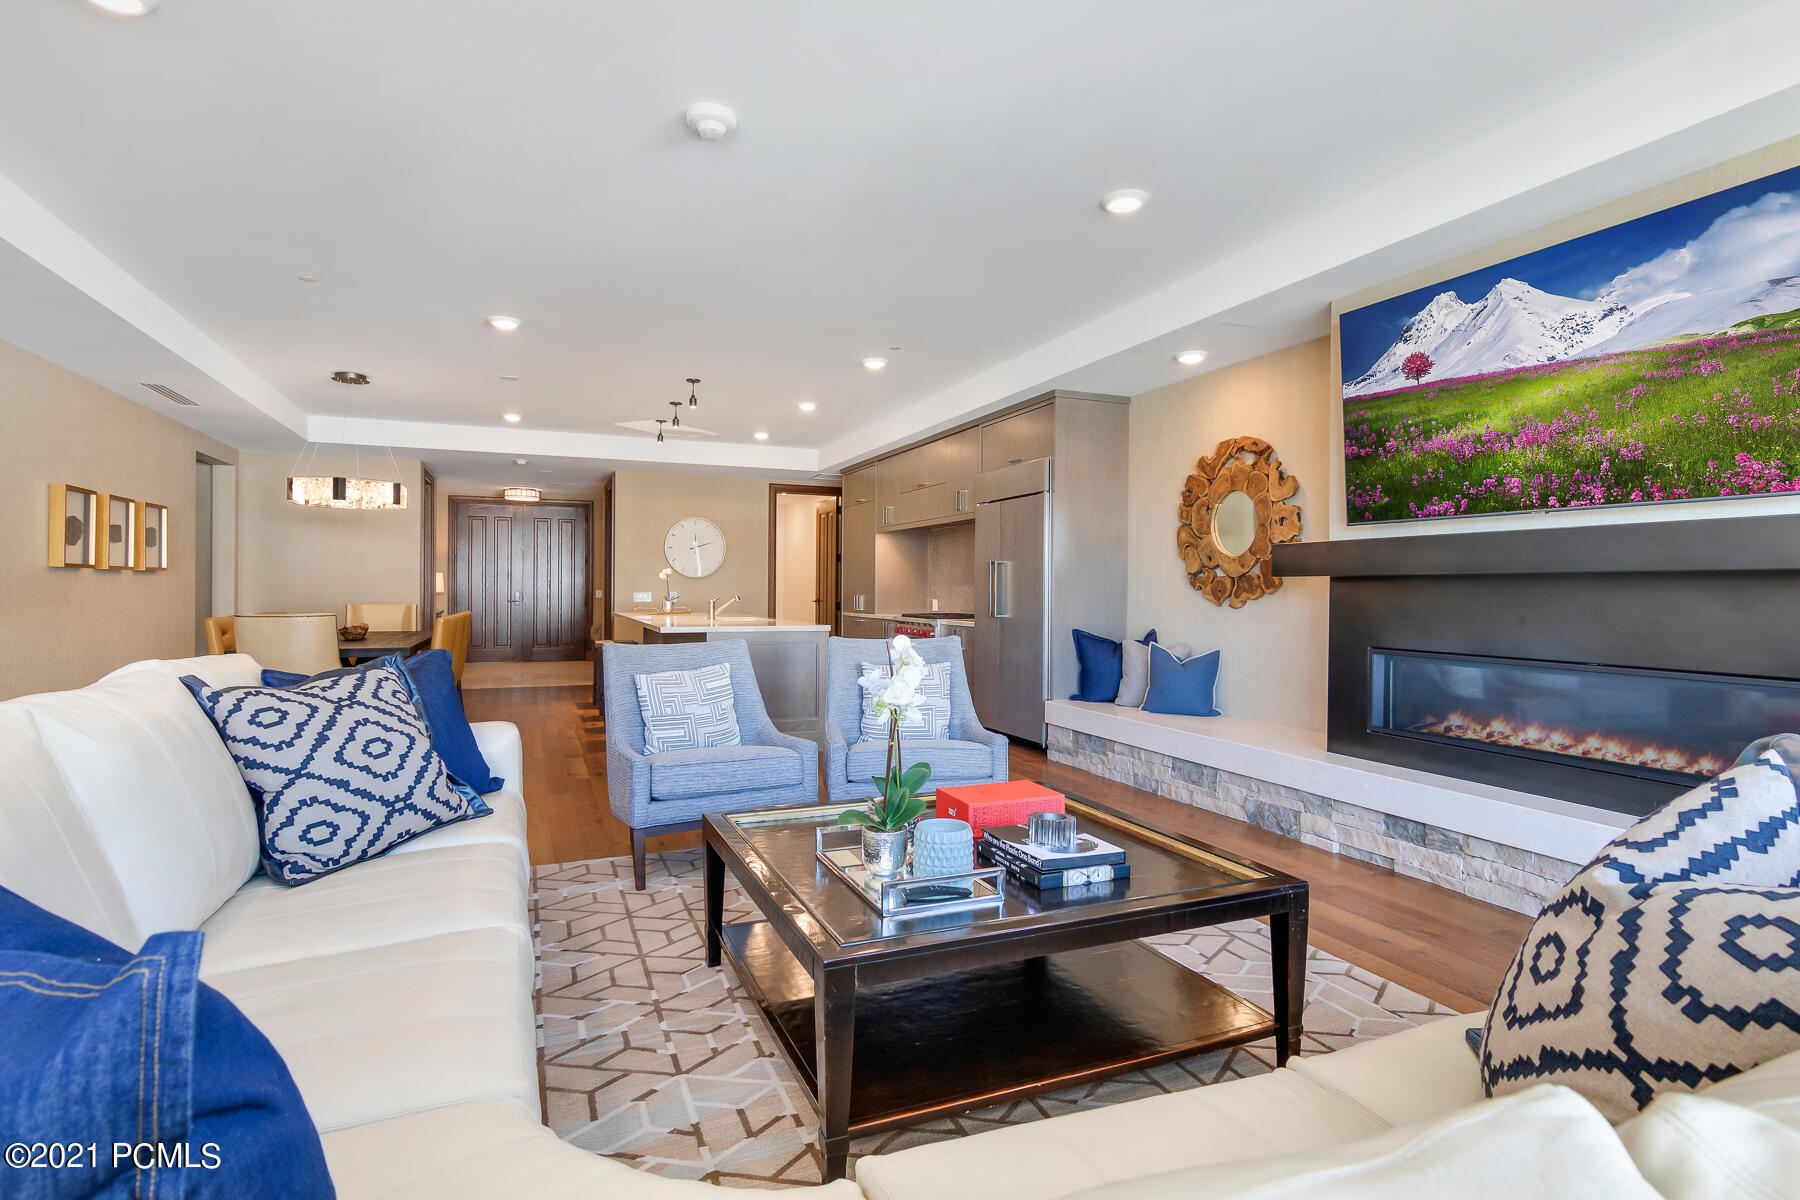 2290 Deer Valley Drive, Park City, Utah 84060, 3 Bedrooms Bedrooms, ,4 BathroomsBathrooms,Condominium,For Sale,Deer Valley,12101660